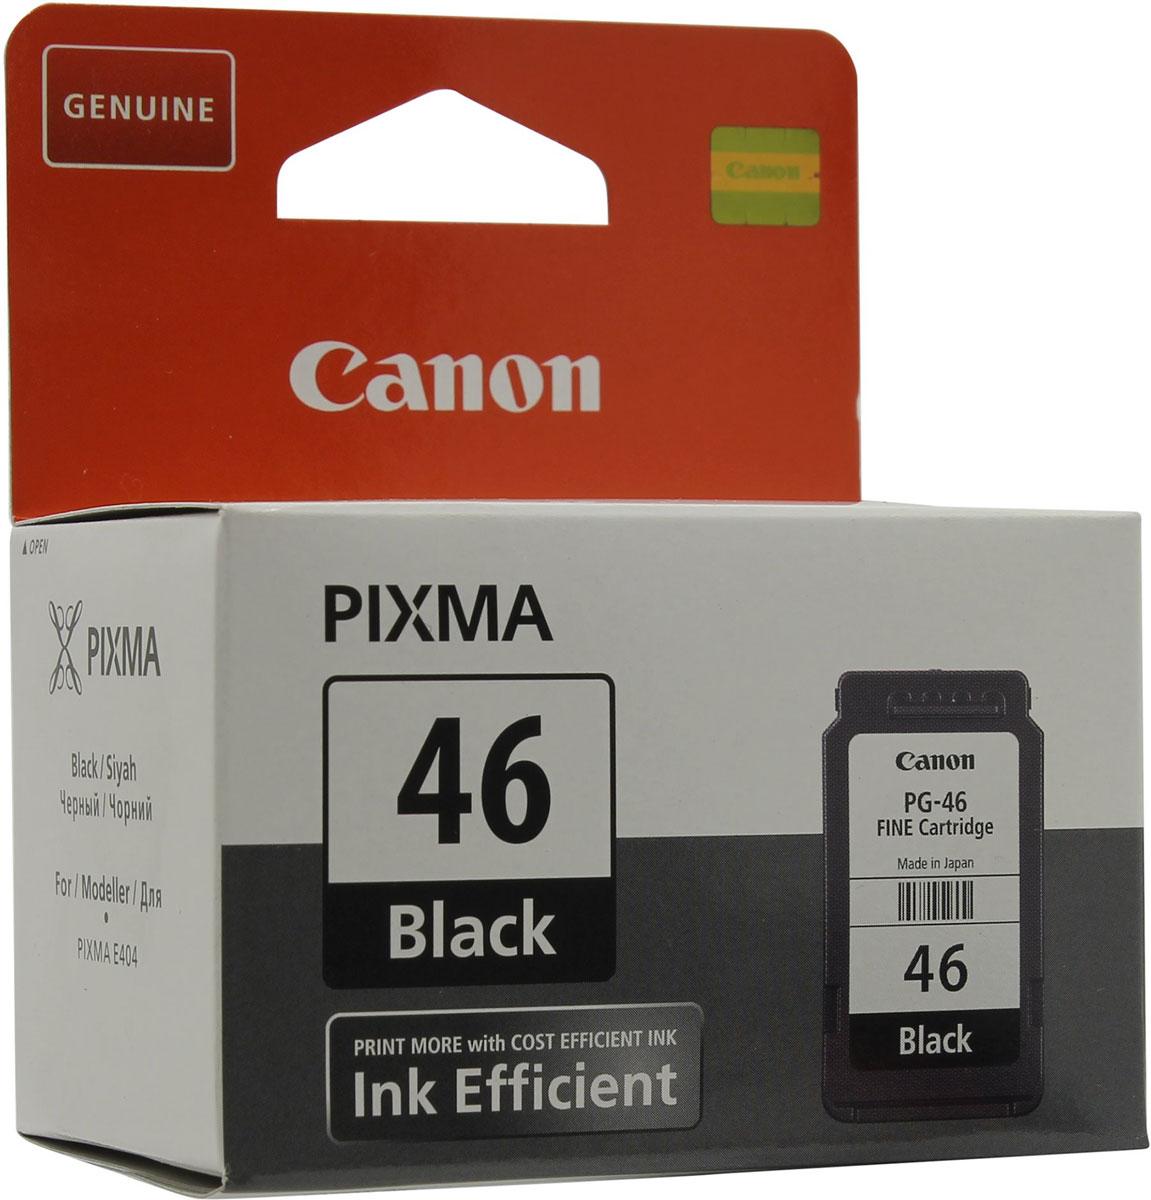 Canon PG-46, Black картридж для Pixma E464 картридж canon pg 40